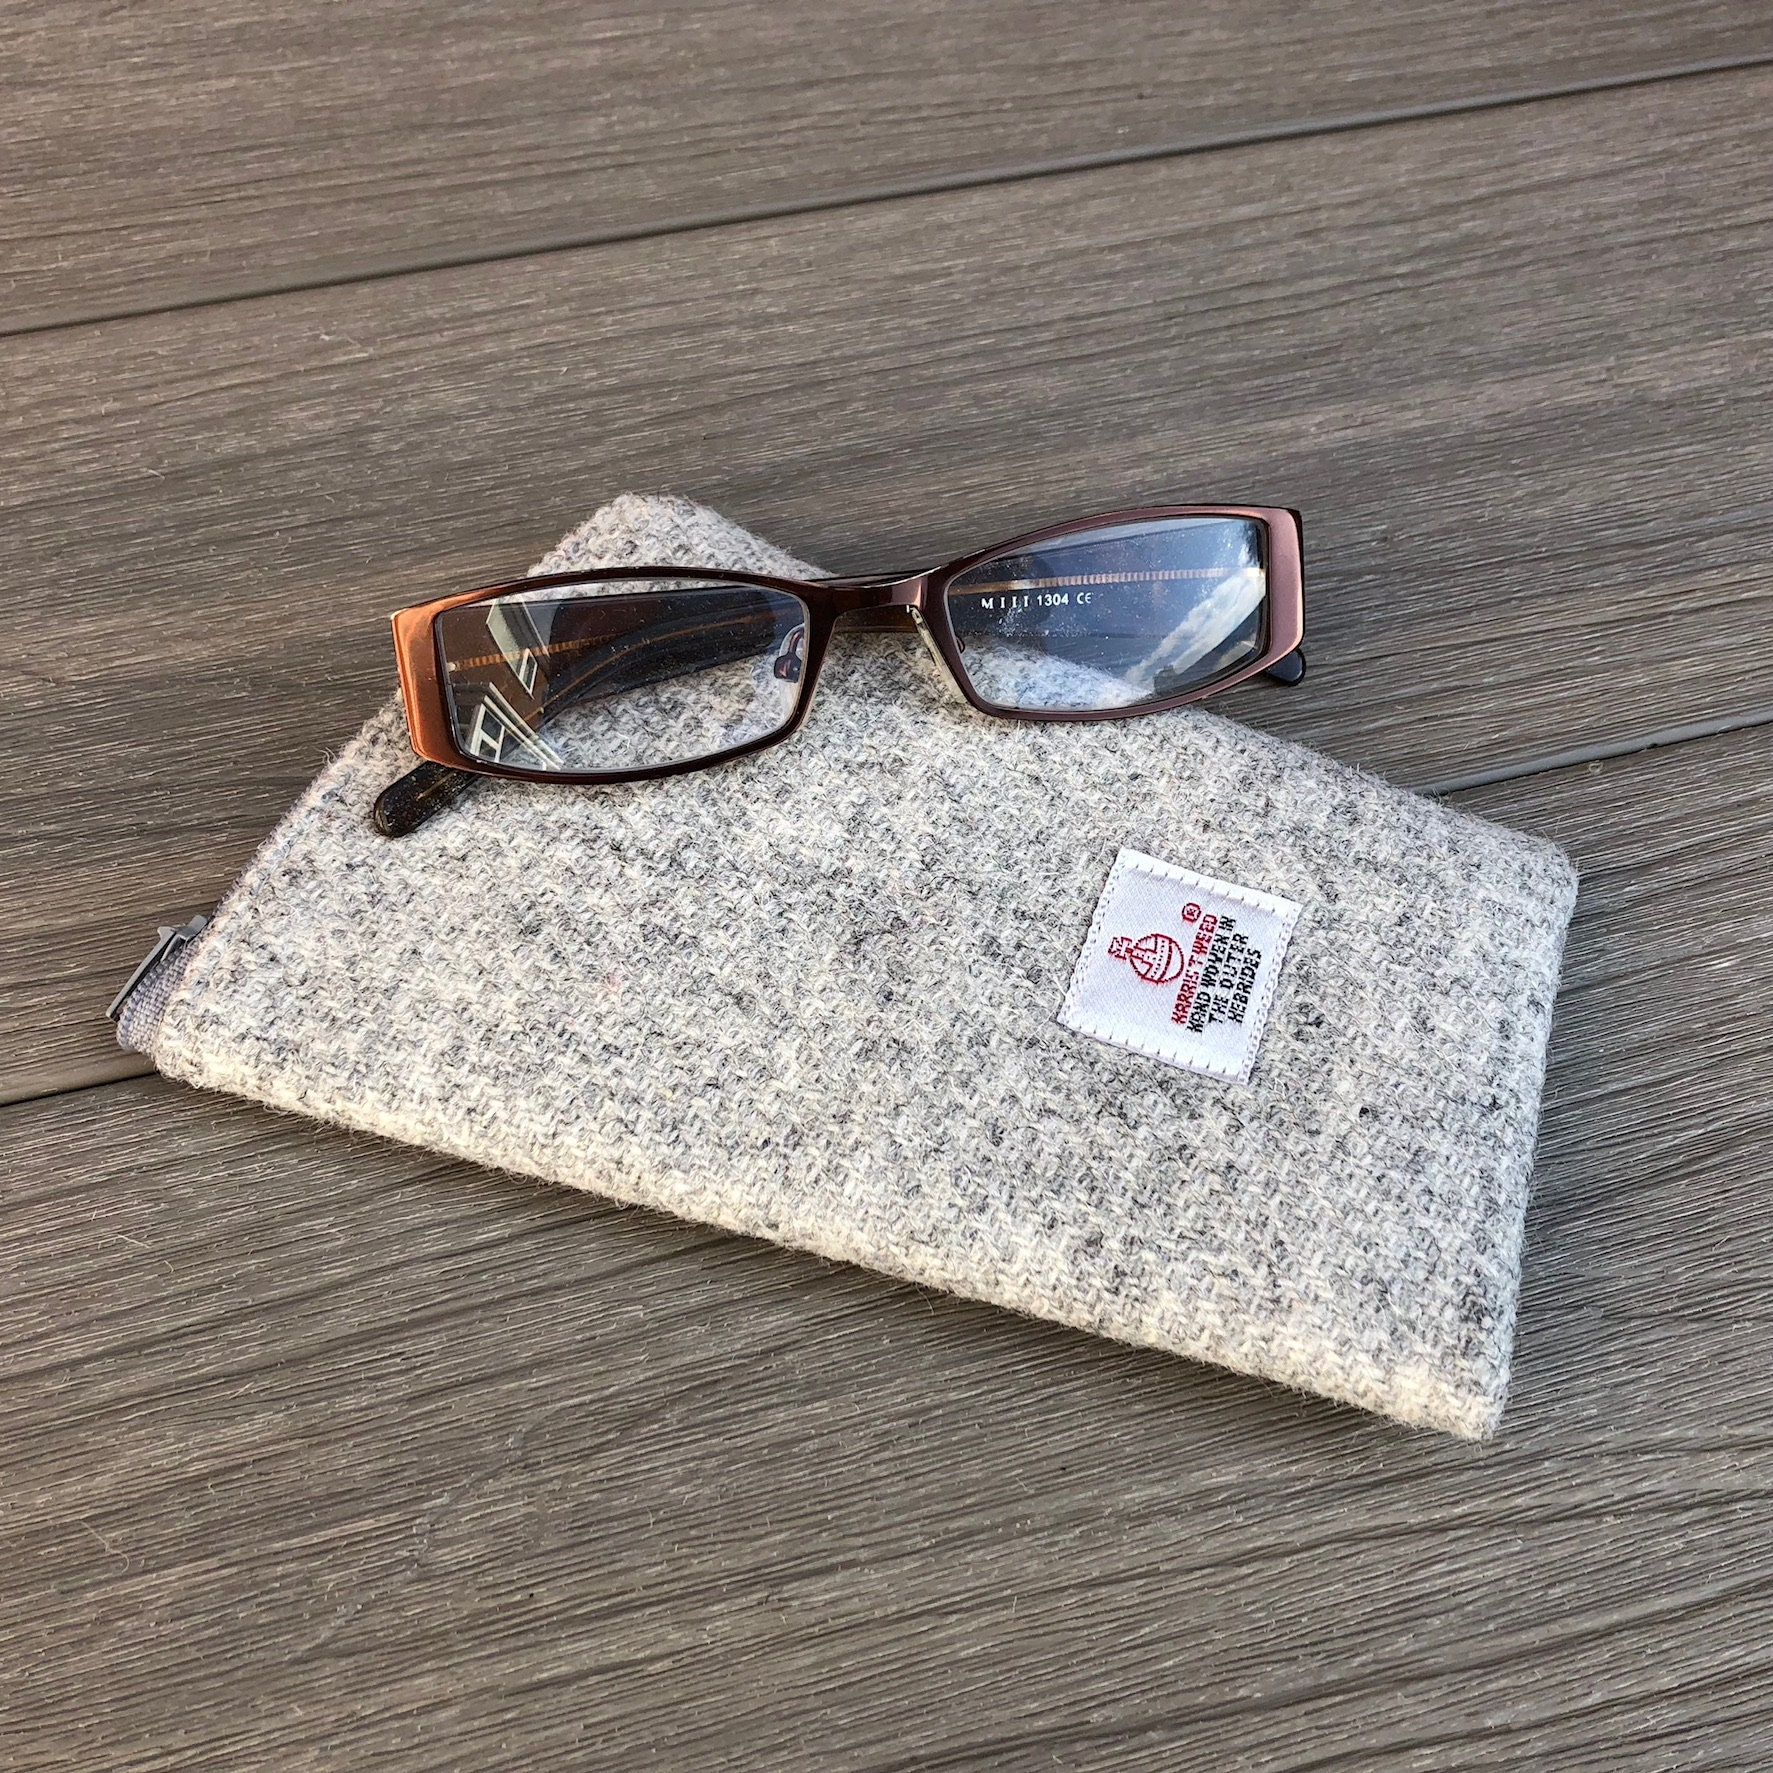 b0b19b8c7cc0 Harris Tweed glasses case soft sunglasses case grey wool